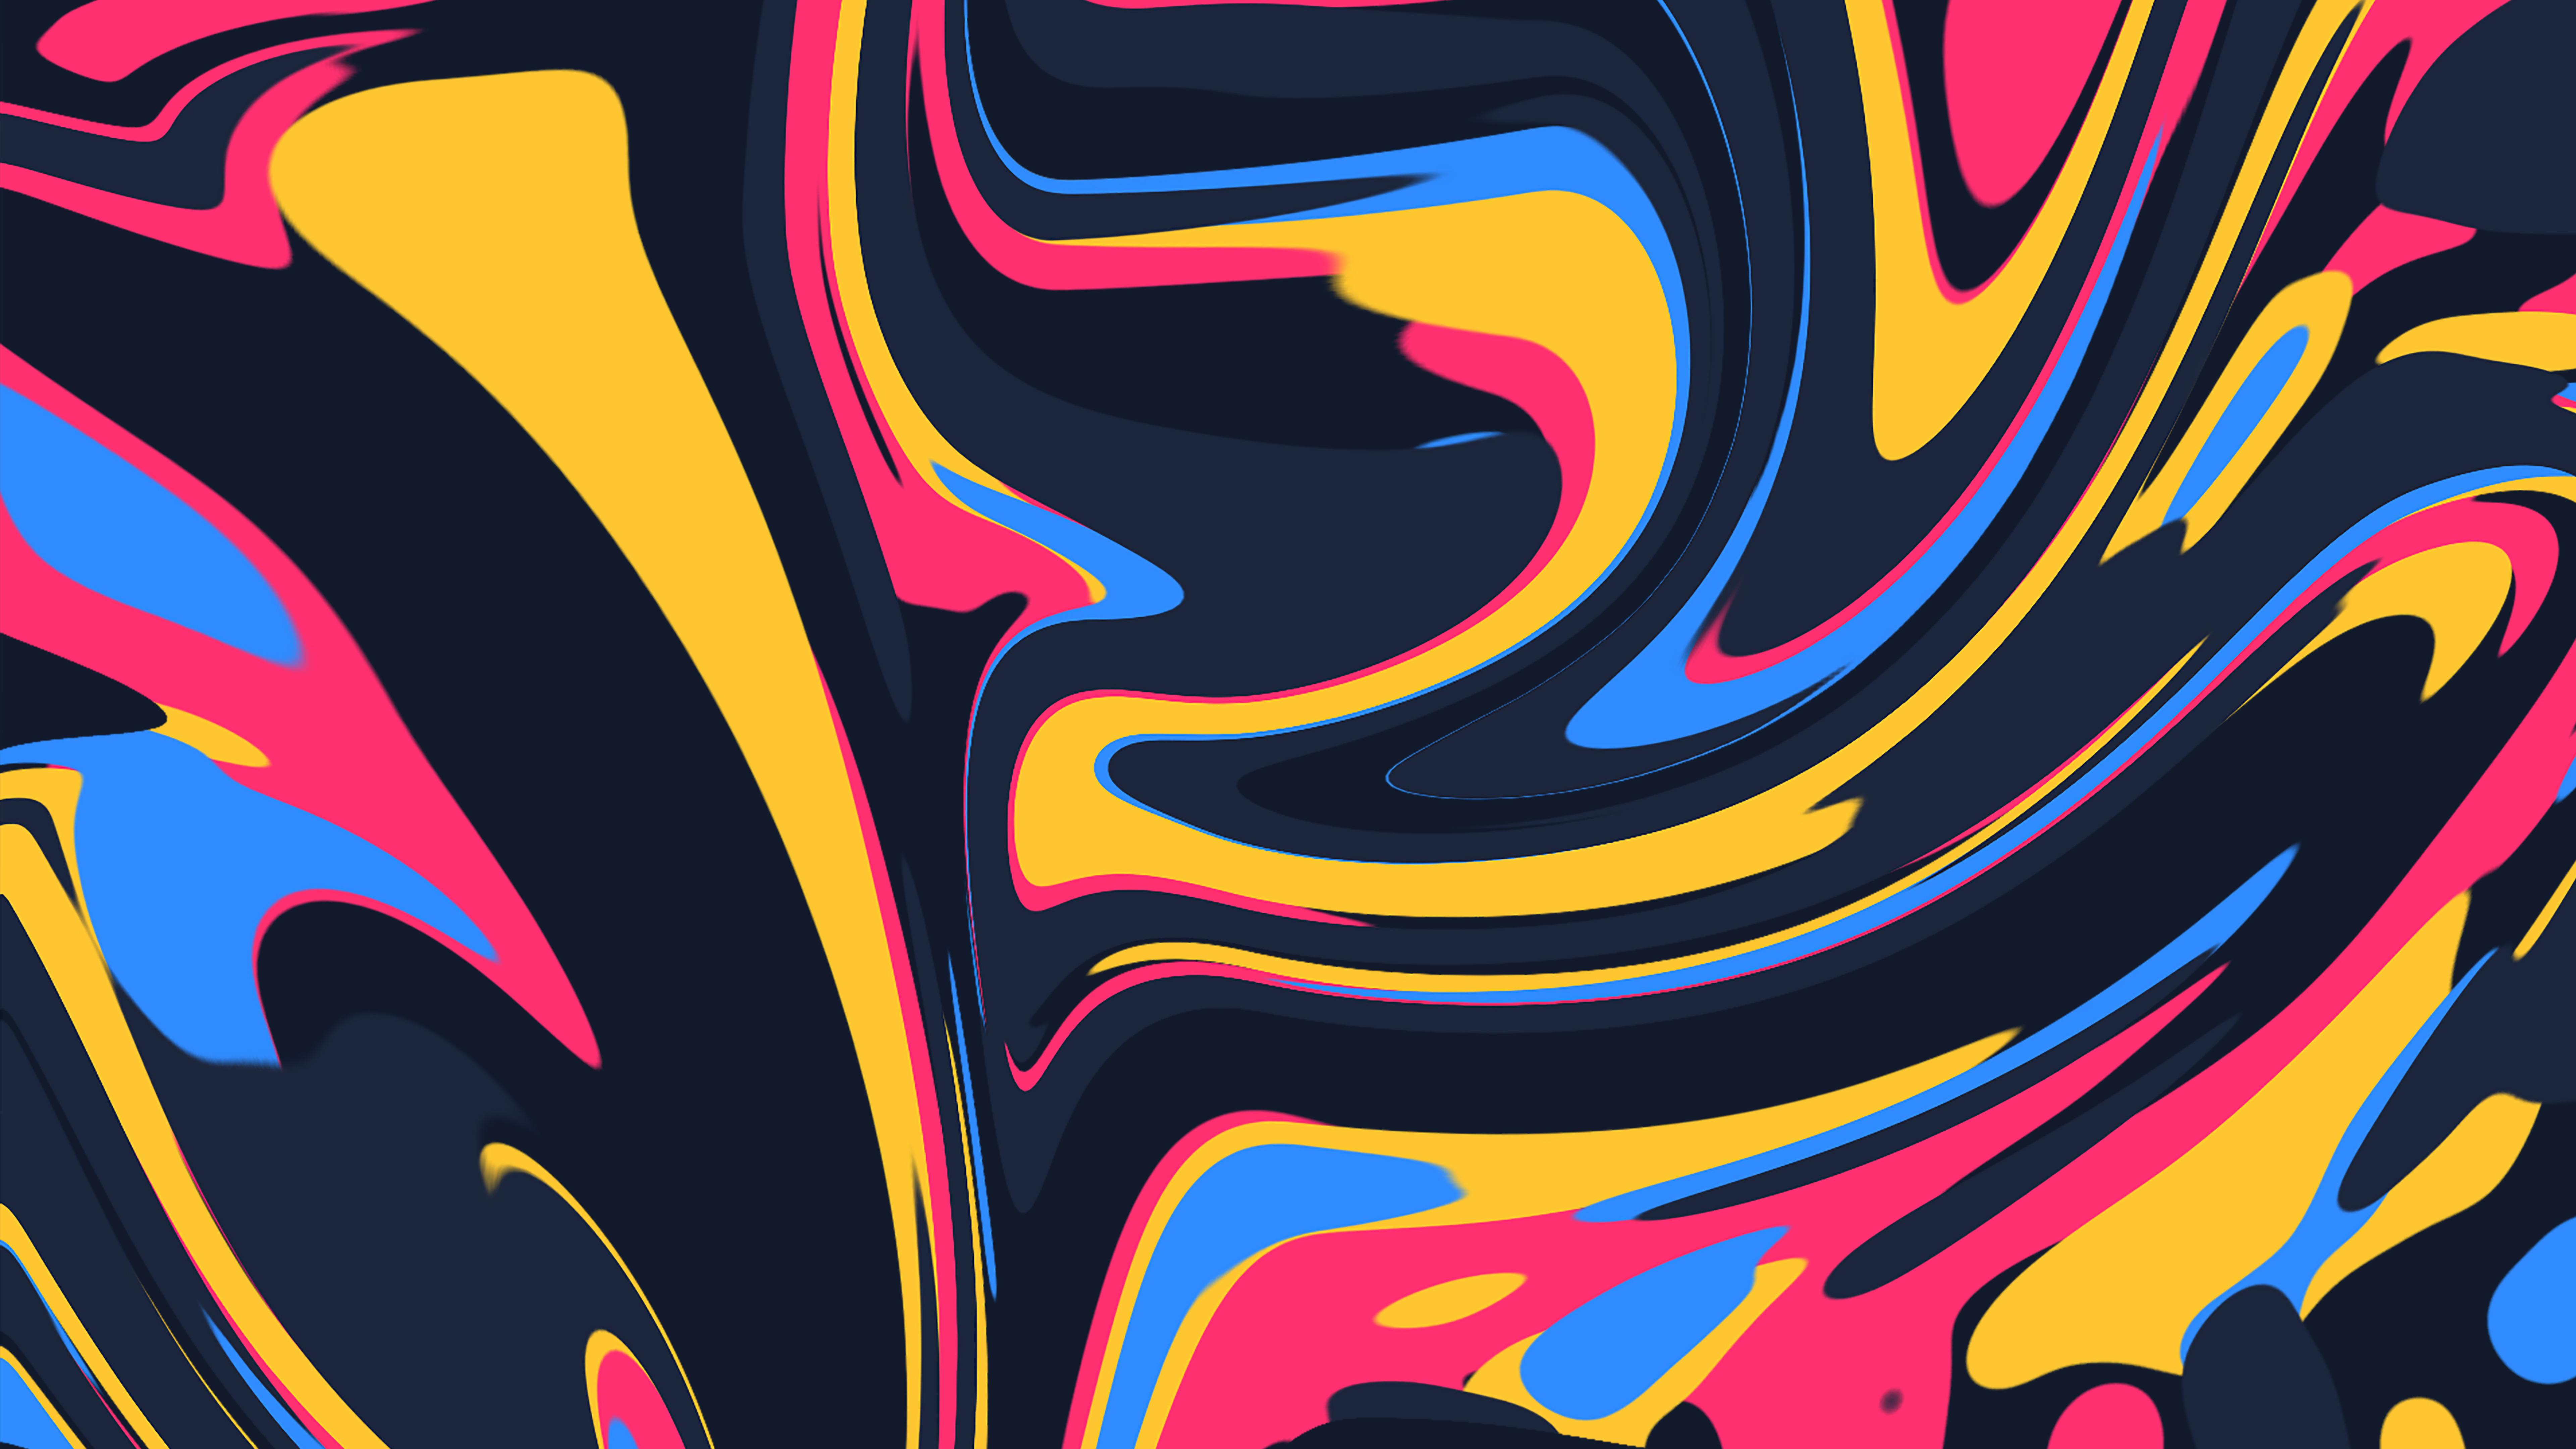 abstract color art 4k 1616870926 - Abstract Color Art 4k - Abstract Color Art 4k wallpapers